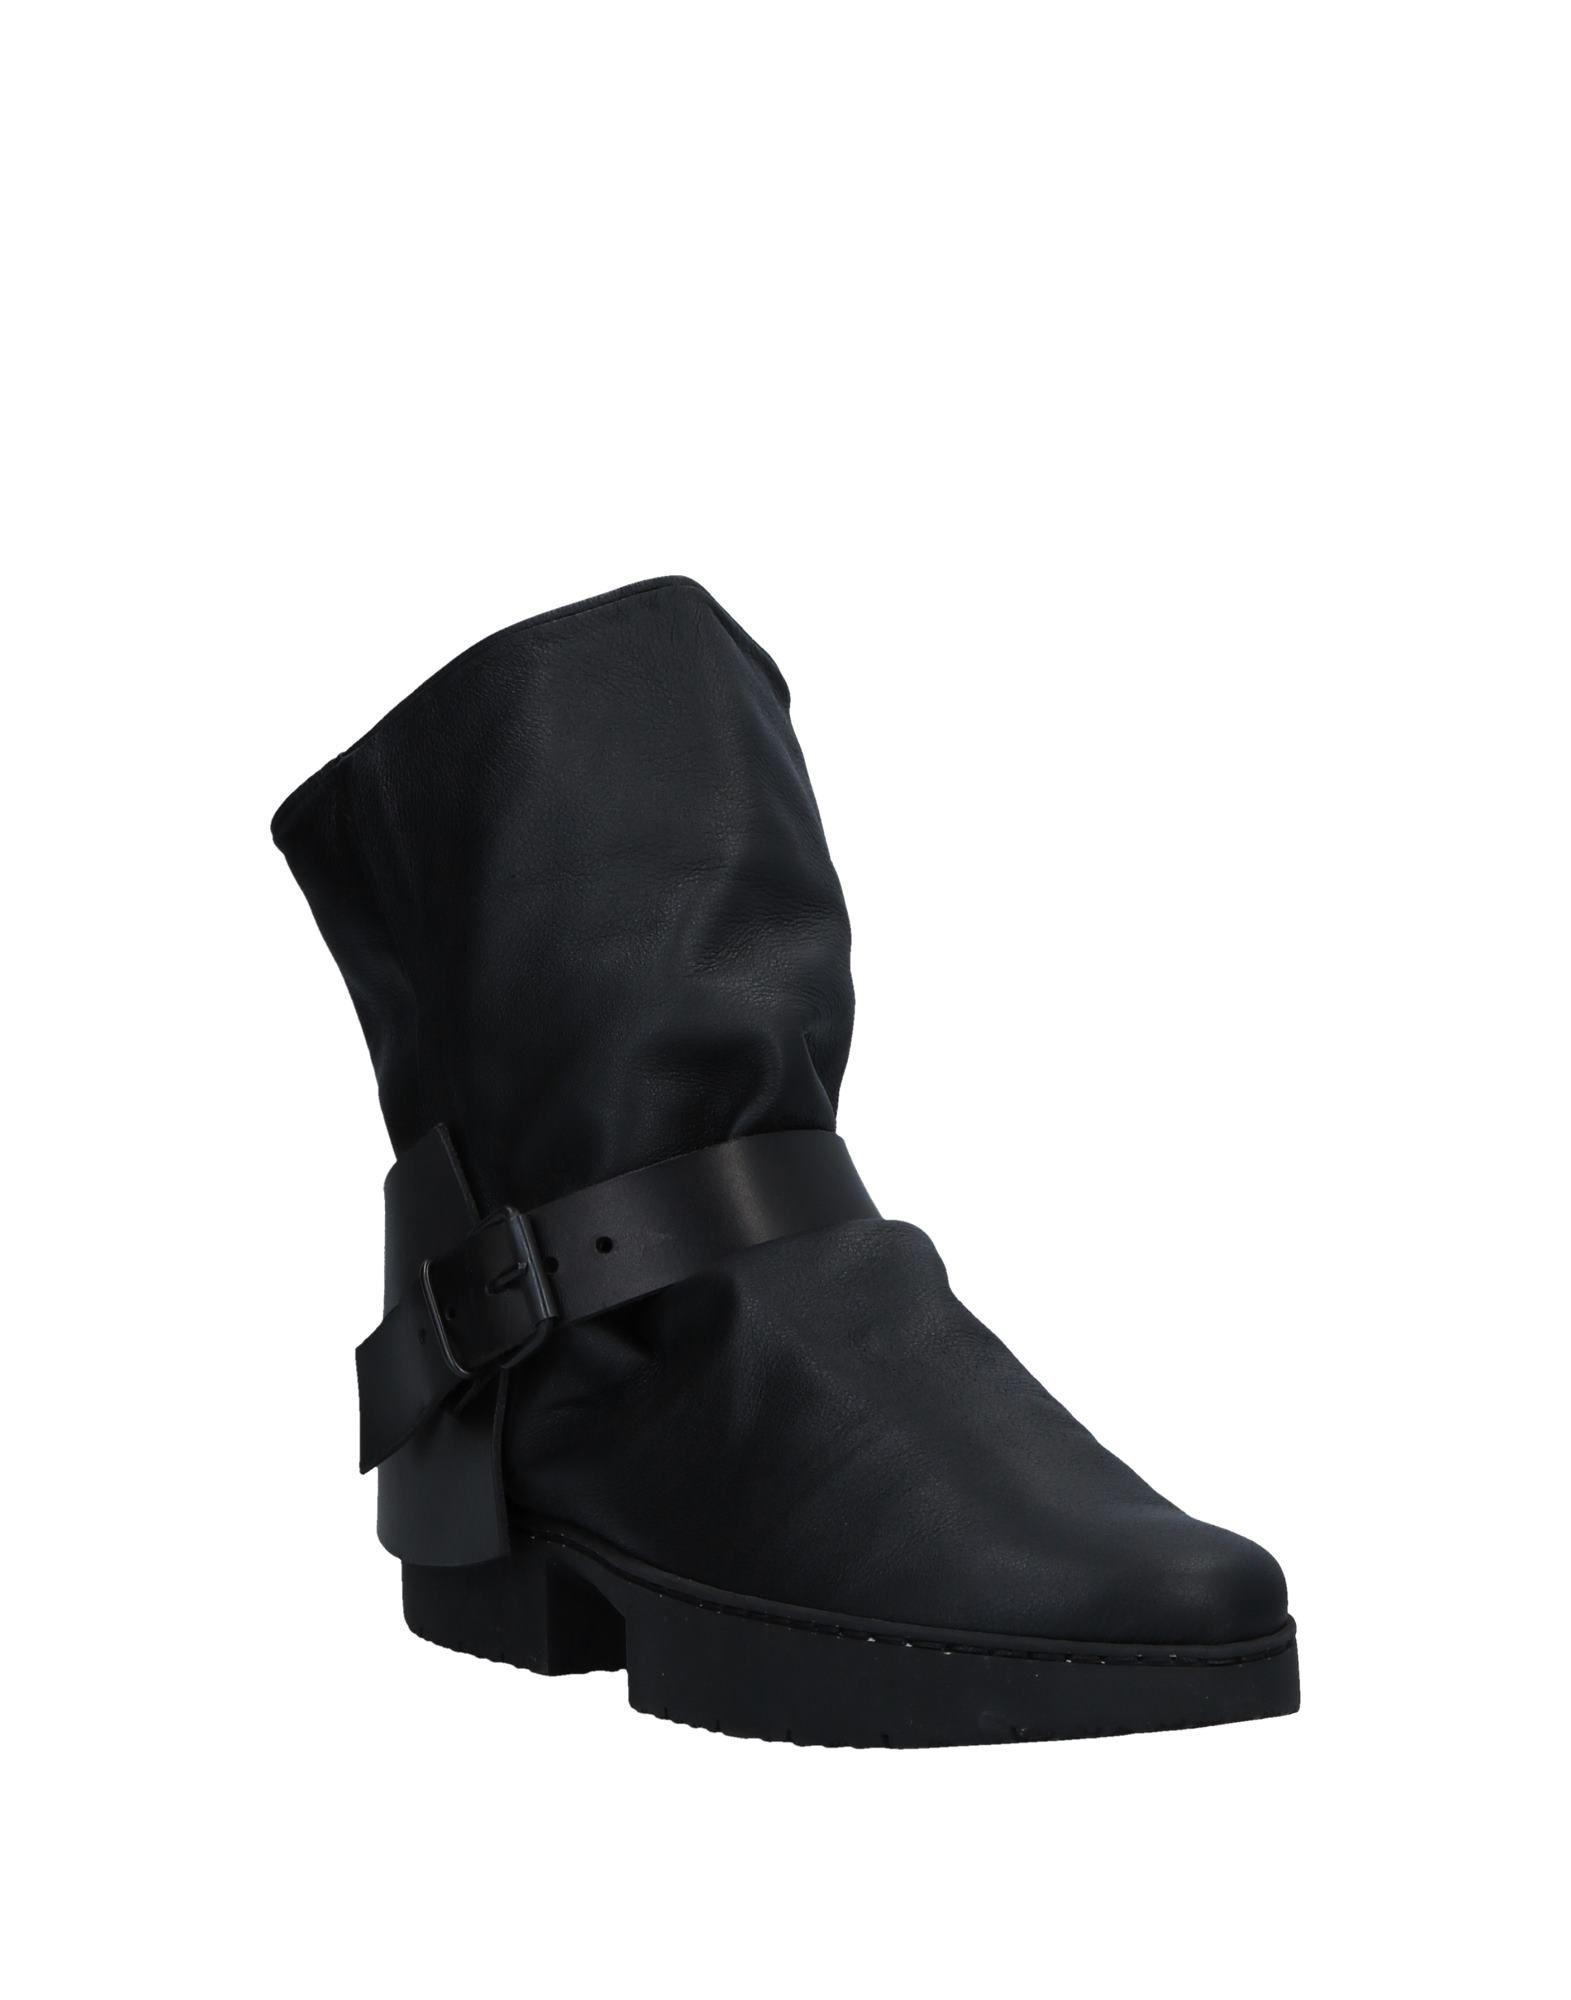 Trippen Stiefelette Damen  11513970HQGut Schuhe aussehende strapazierfähige Schuhe 11513970HQGut 4634de